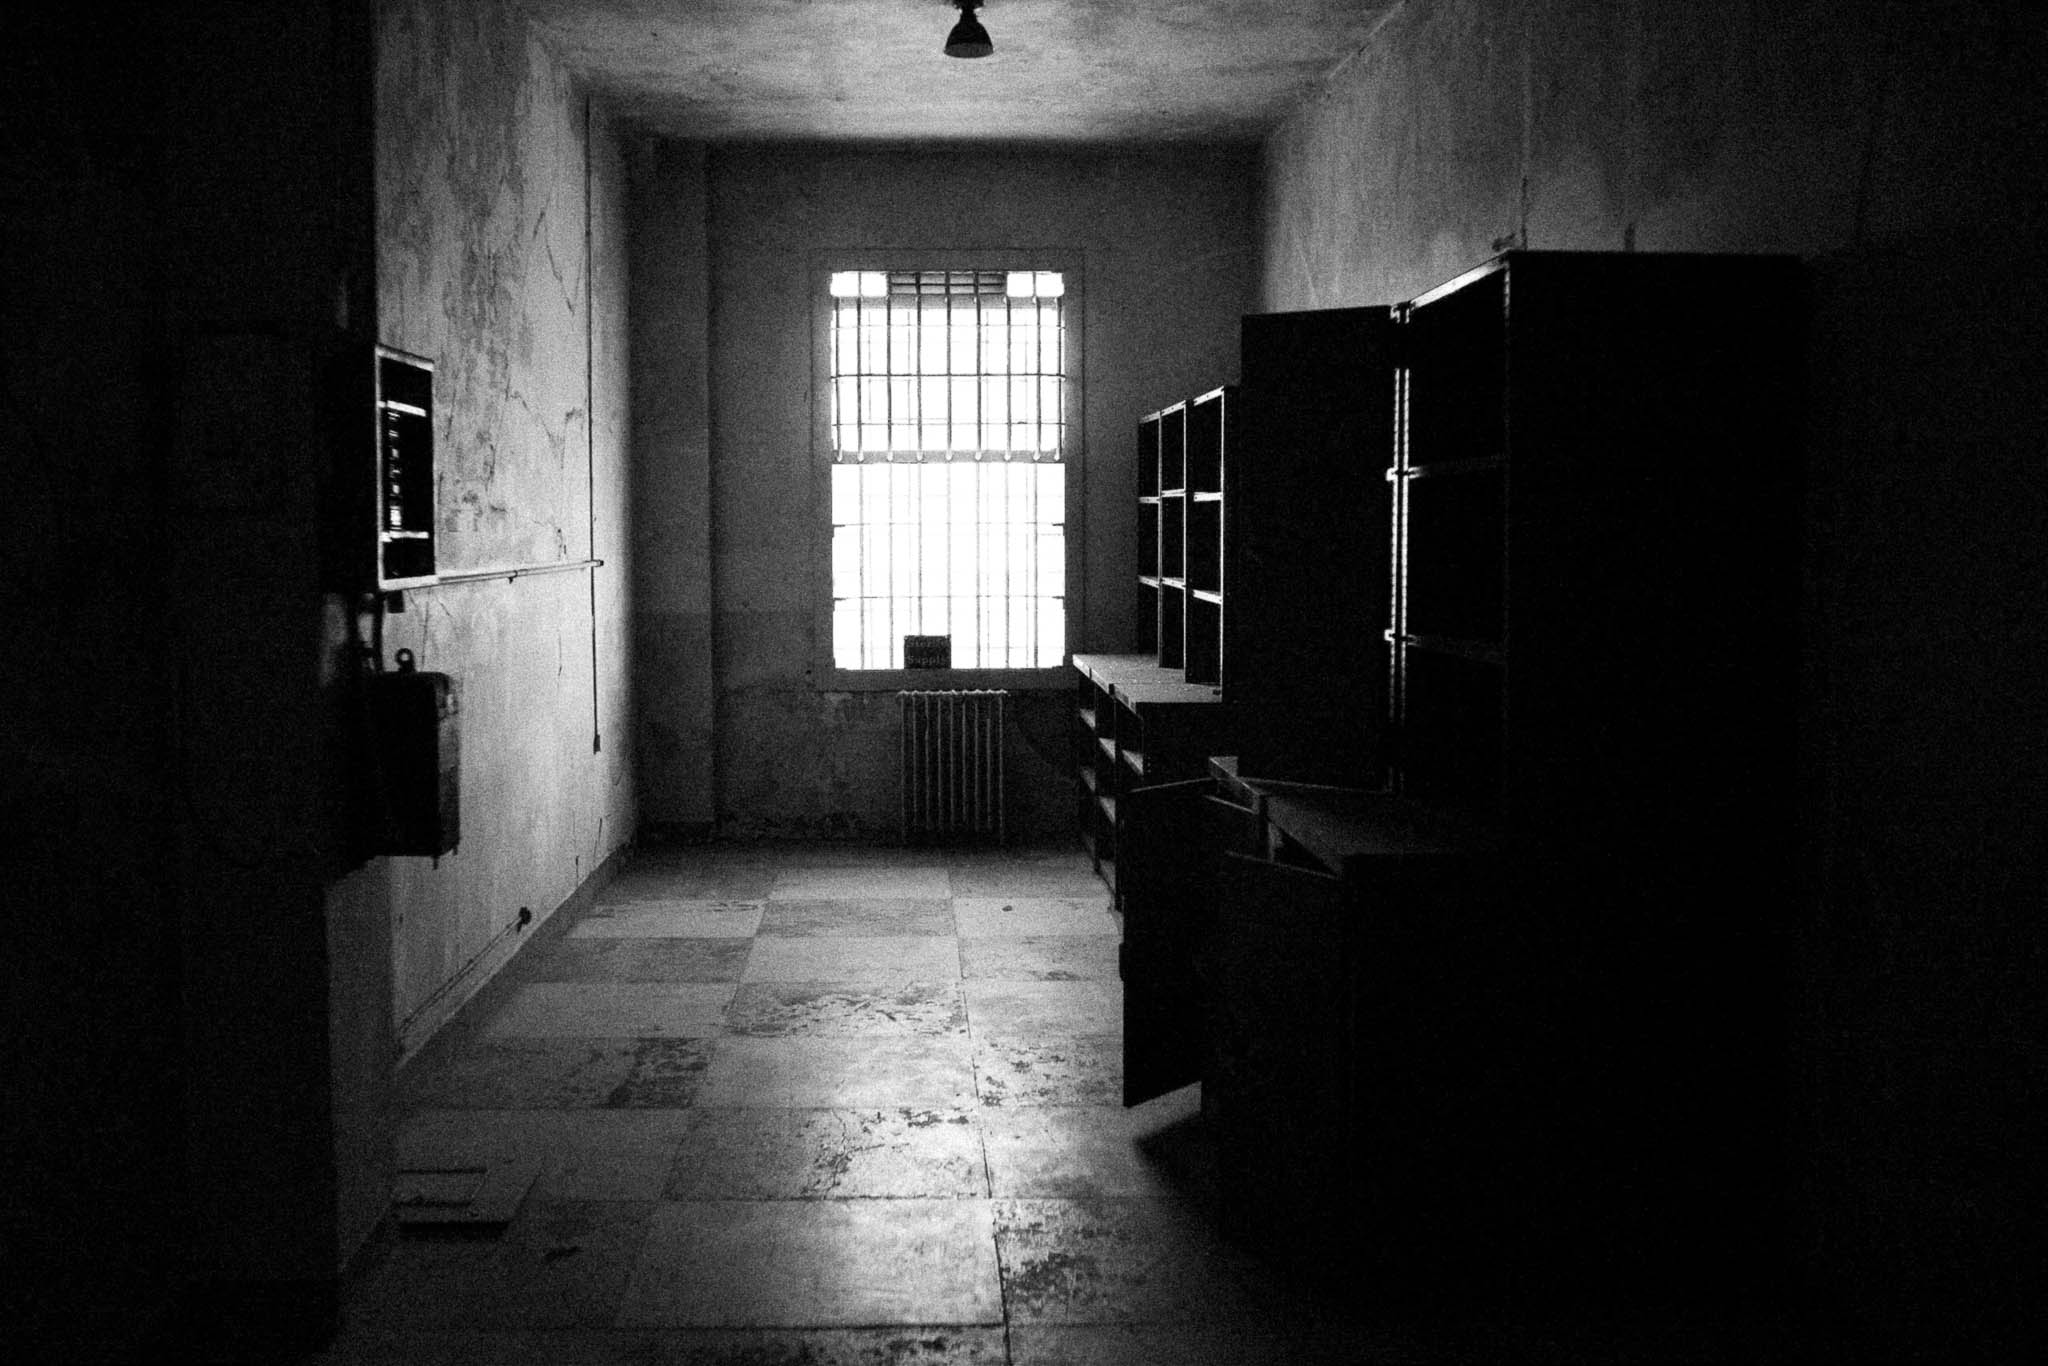 Alcatraz_SFProject_20150510_A7M2_03998_©2015ArgunTekant.jpg